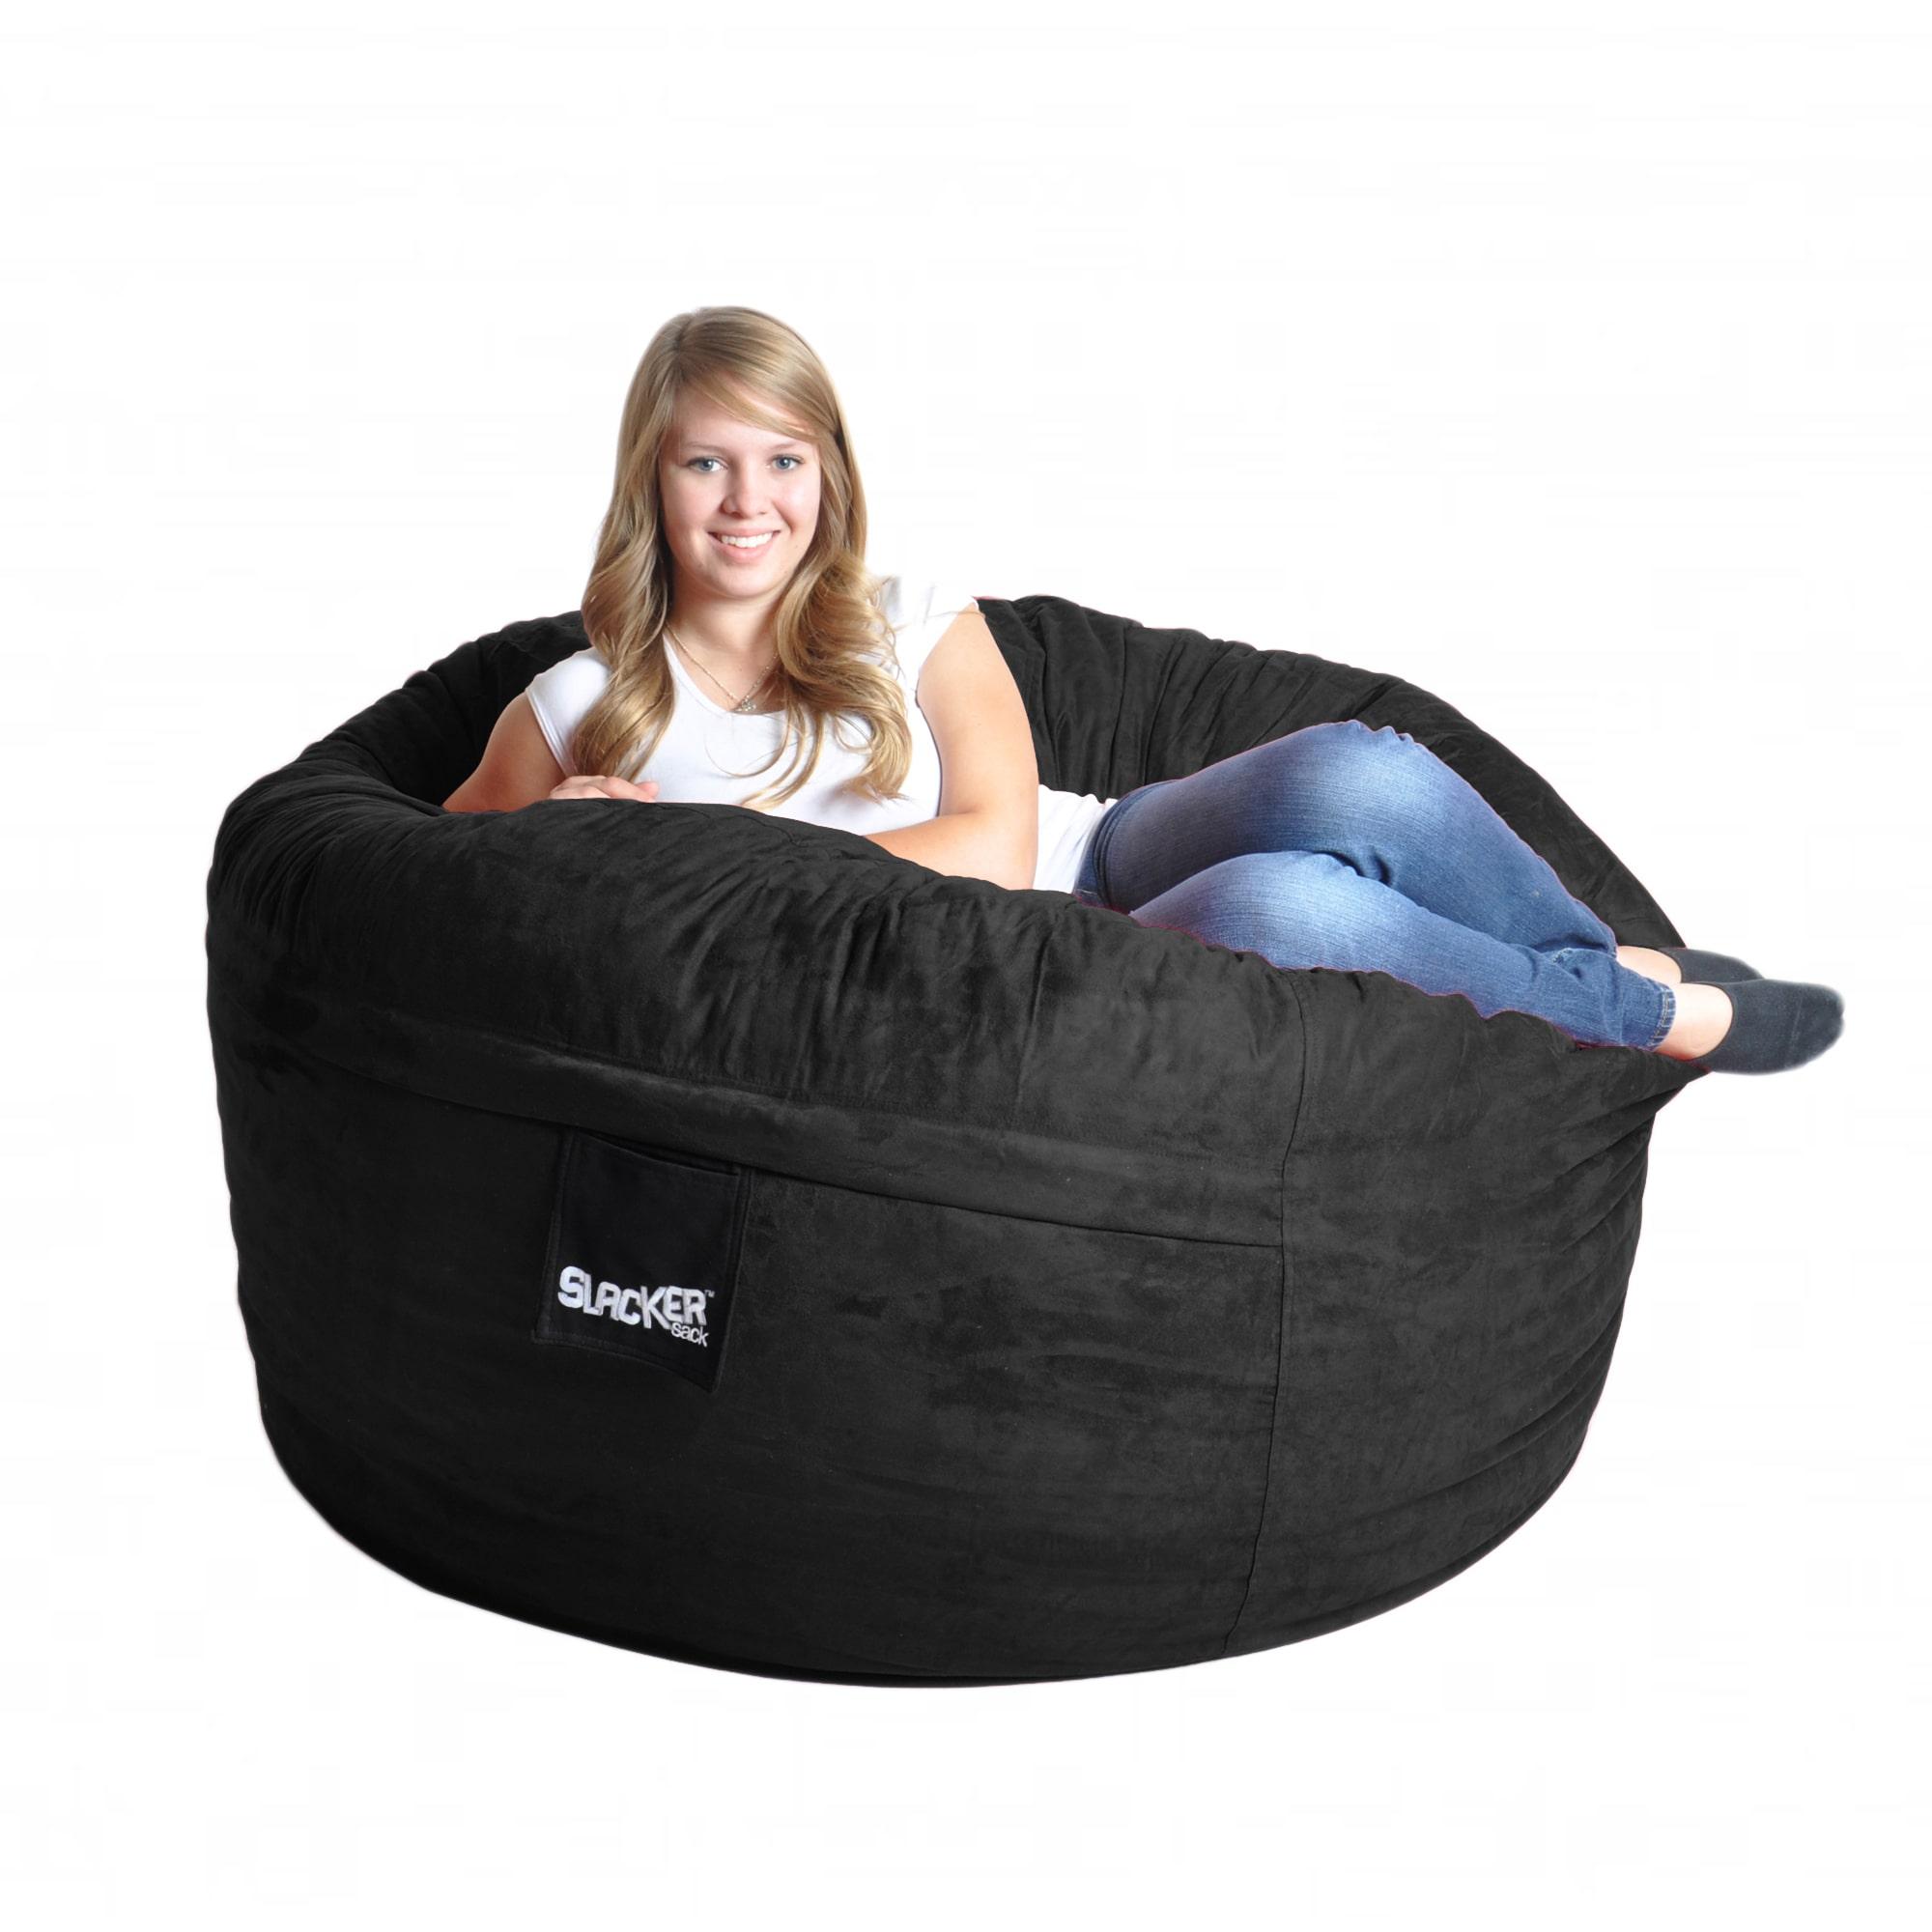 Slacker Sack Black Microfiber and Foam Bean Bag Chair (5' round)